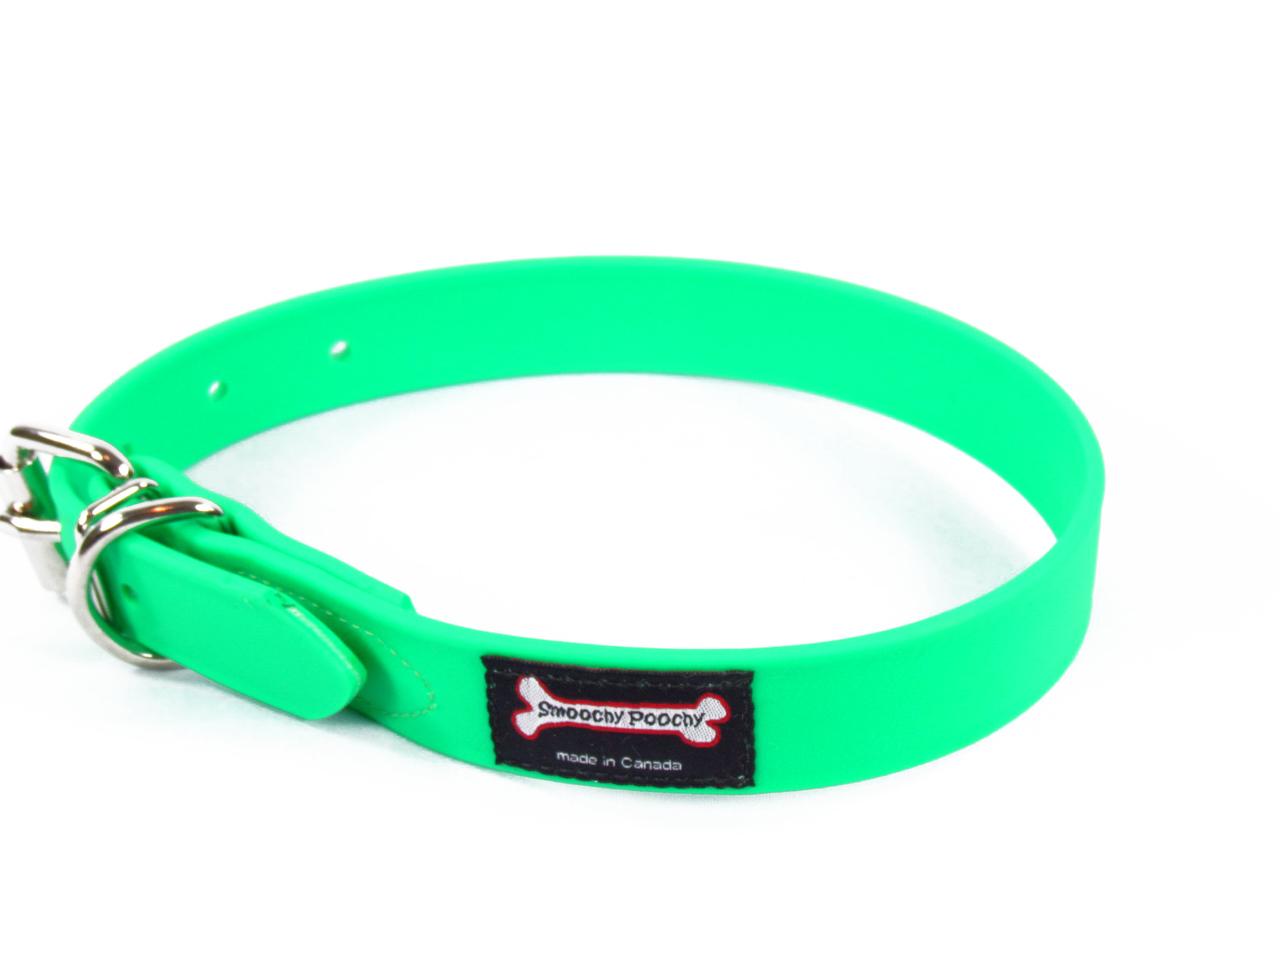 Smoochy Poochy Polyvinyl Waterproof Dog Collar, Apple, Large